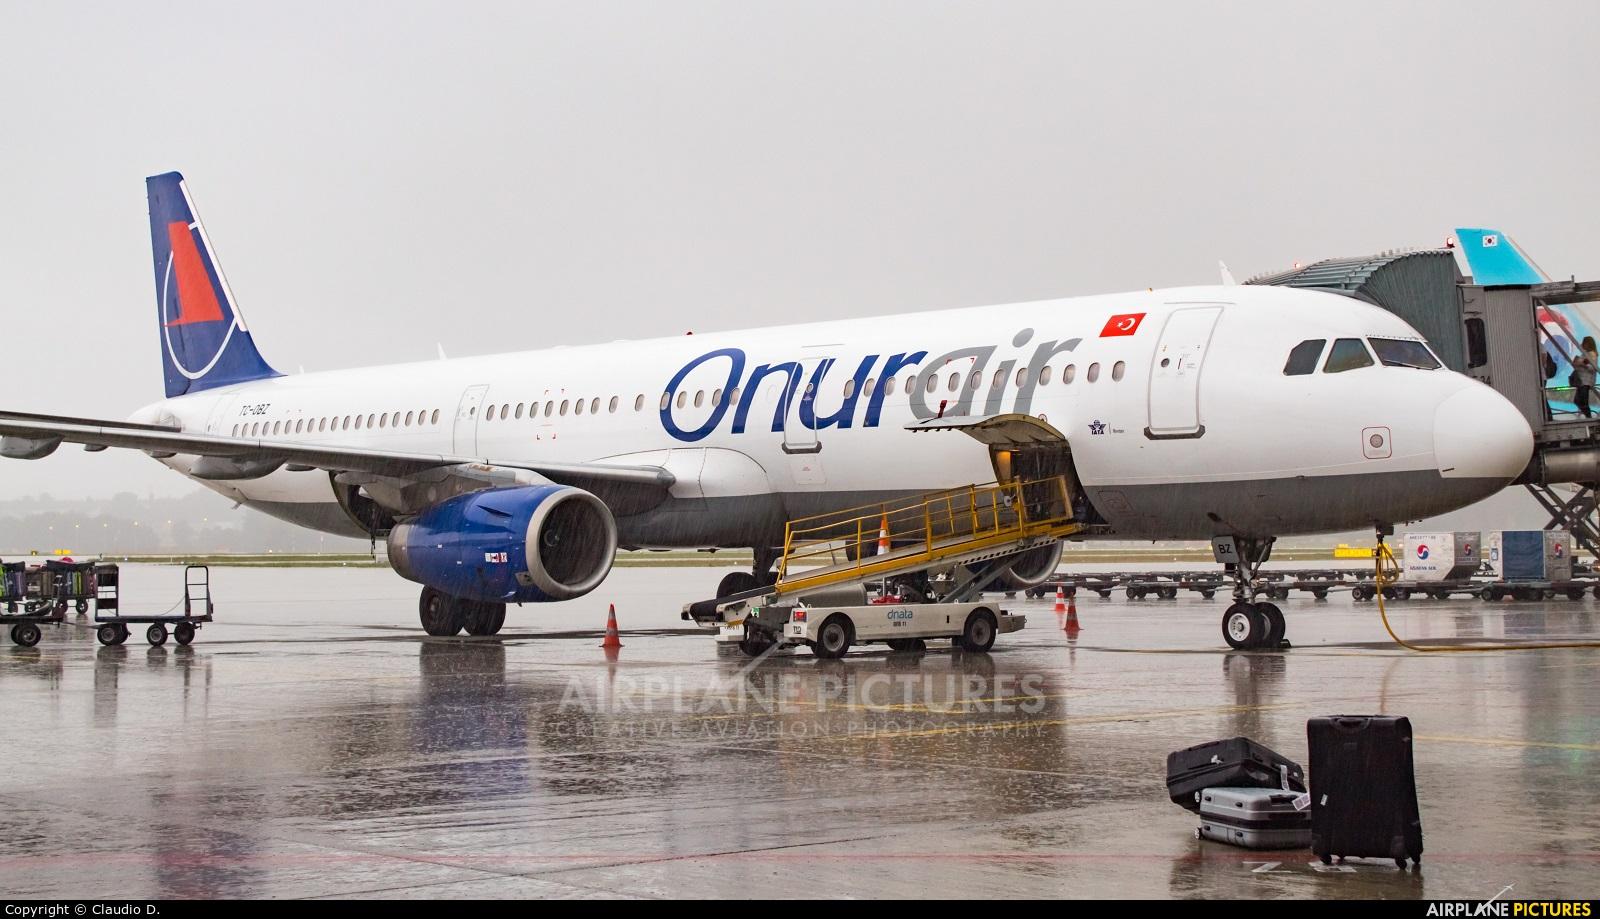 Onur Air TC-OBZ aircraft at Zurich